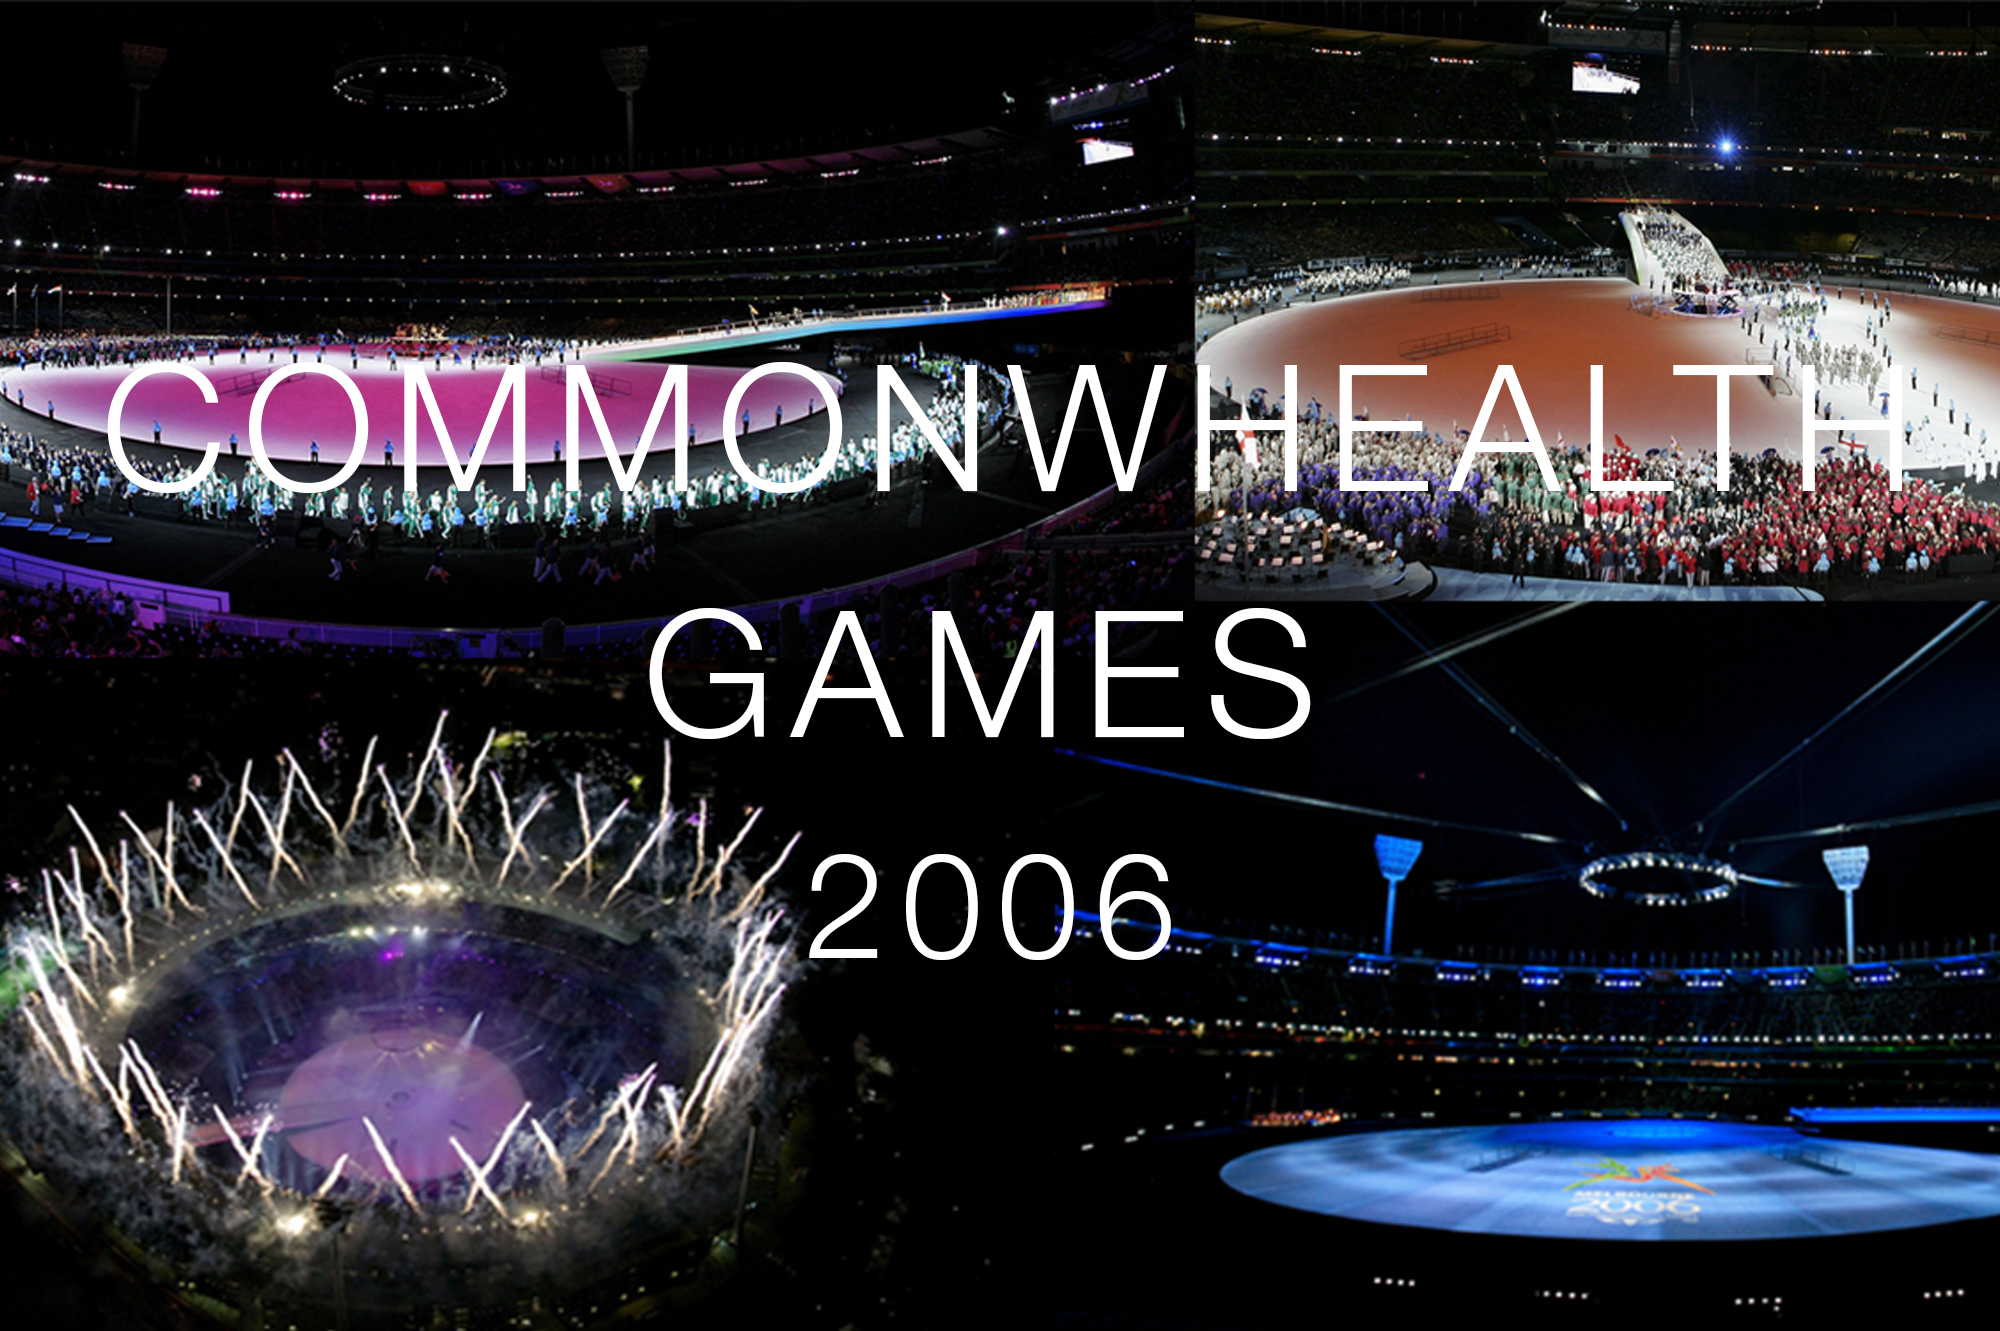 2006-commonwhealth-games.jpg